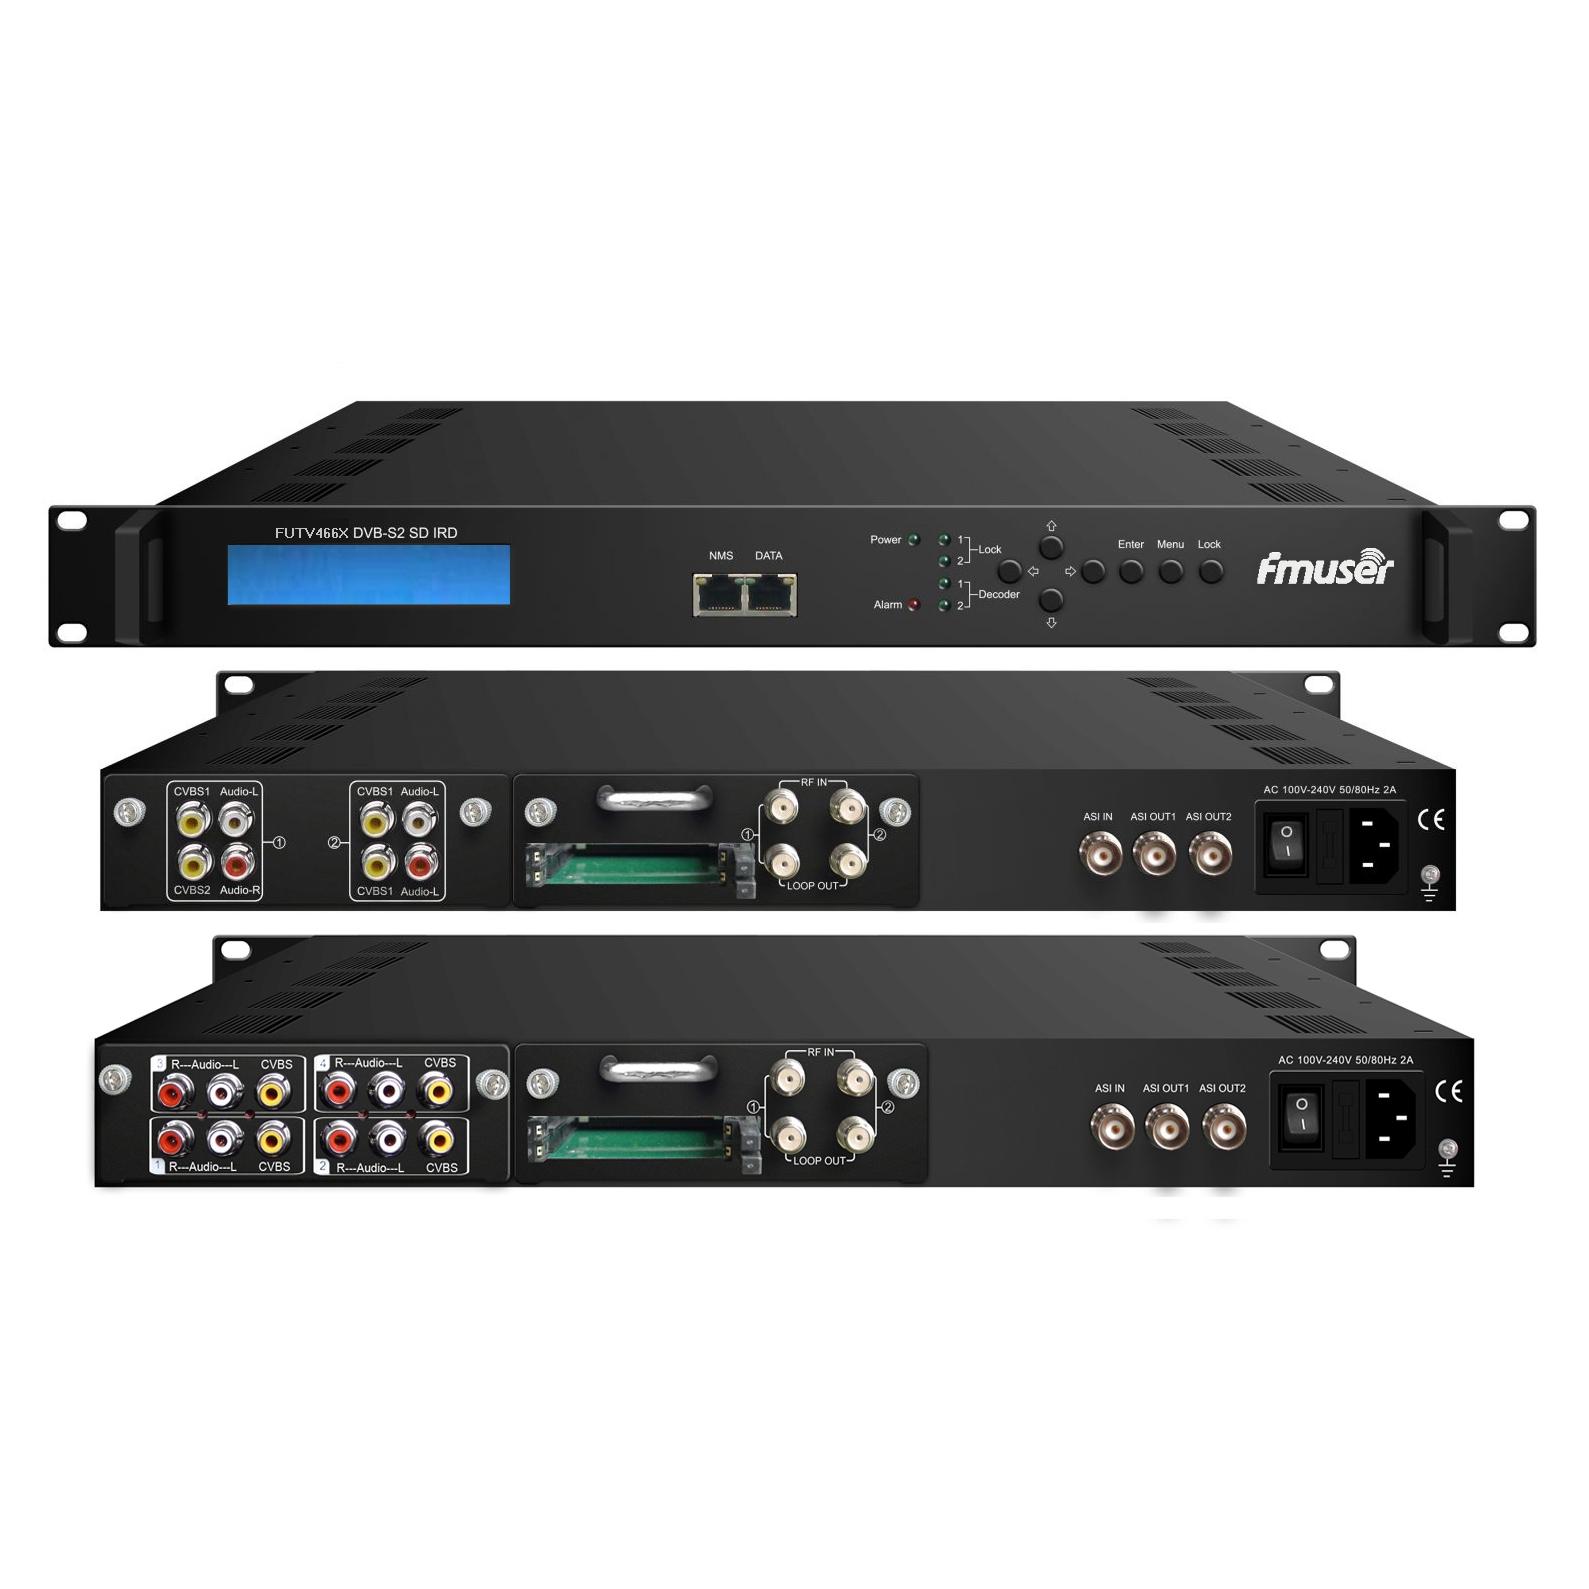 FMUSER FUTV466X 2 тунер CAM SD IRD (2 DVB-C / T / S / S2 RF вход, 1 ASI IP вход, 2 ASI 1 IP изход) с MUX